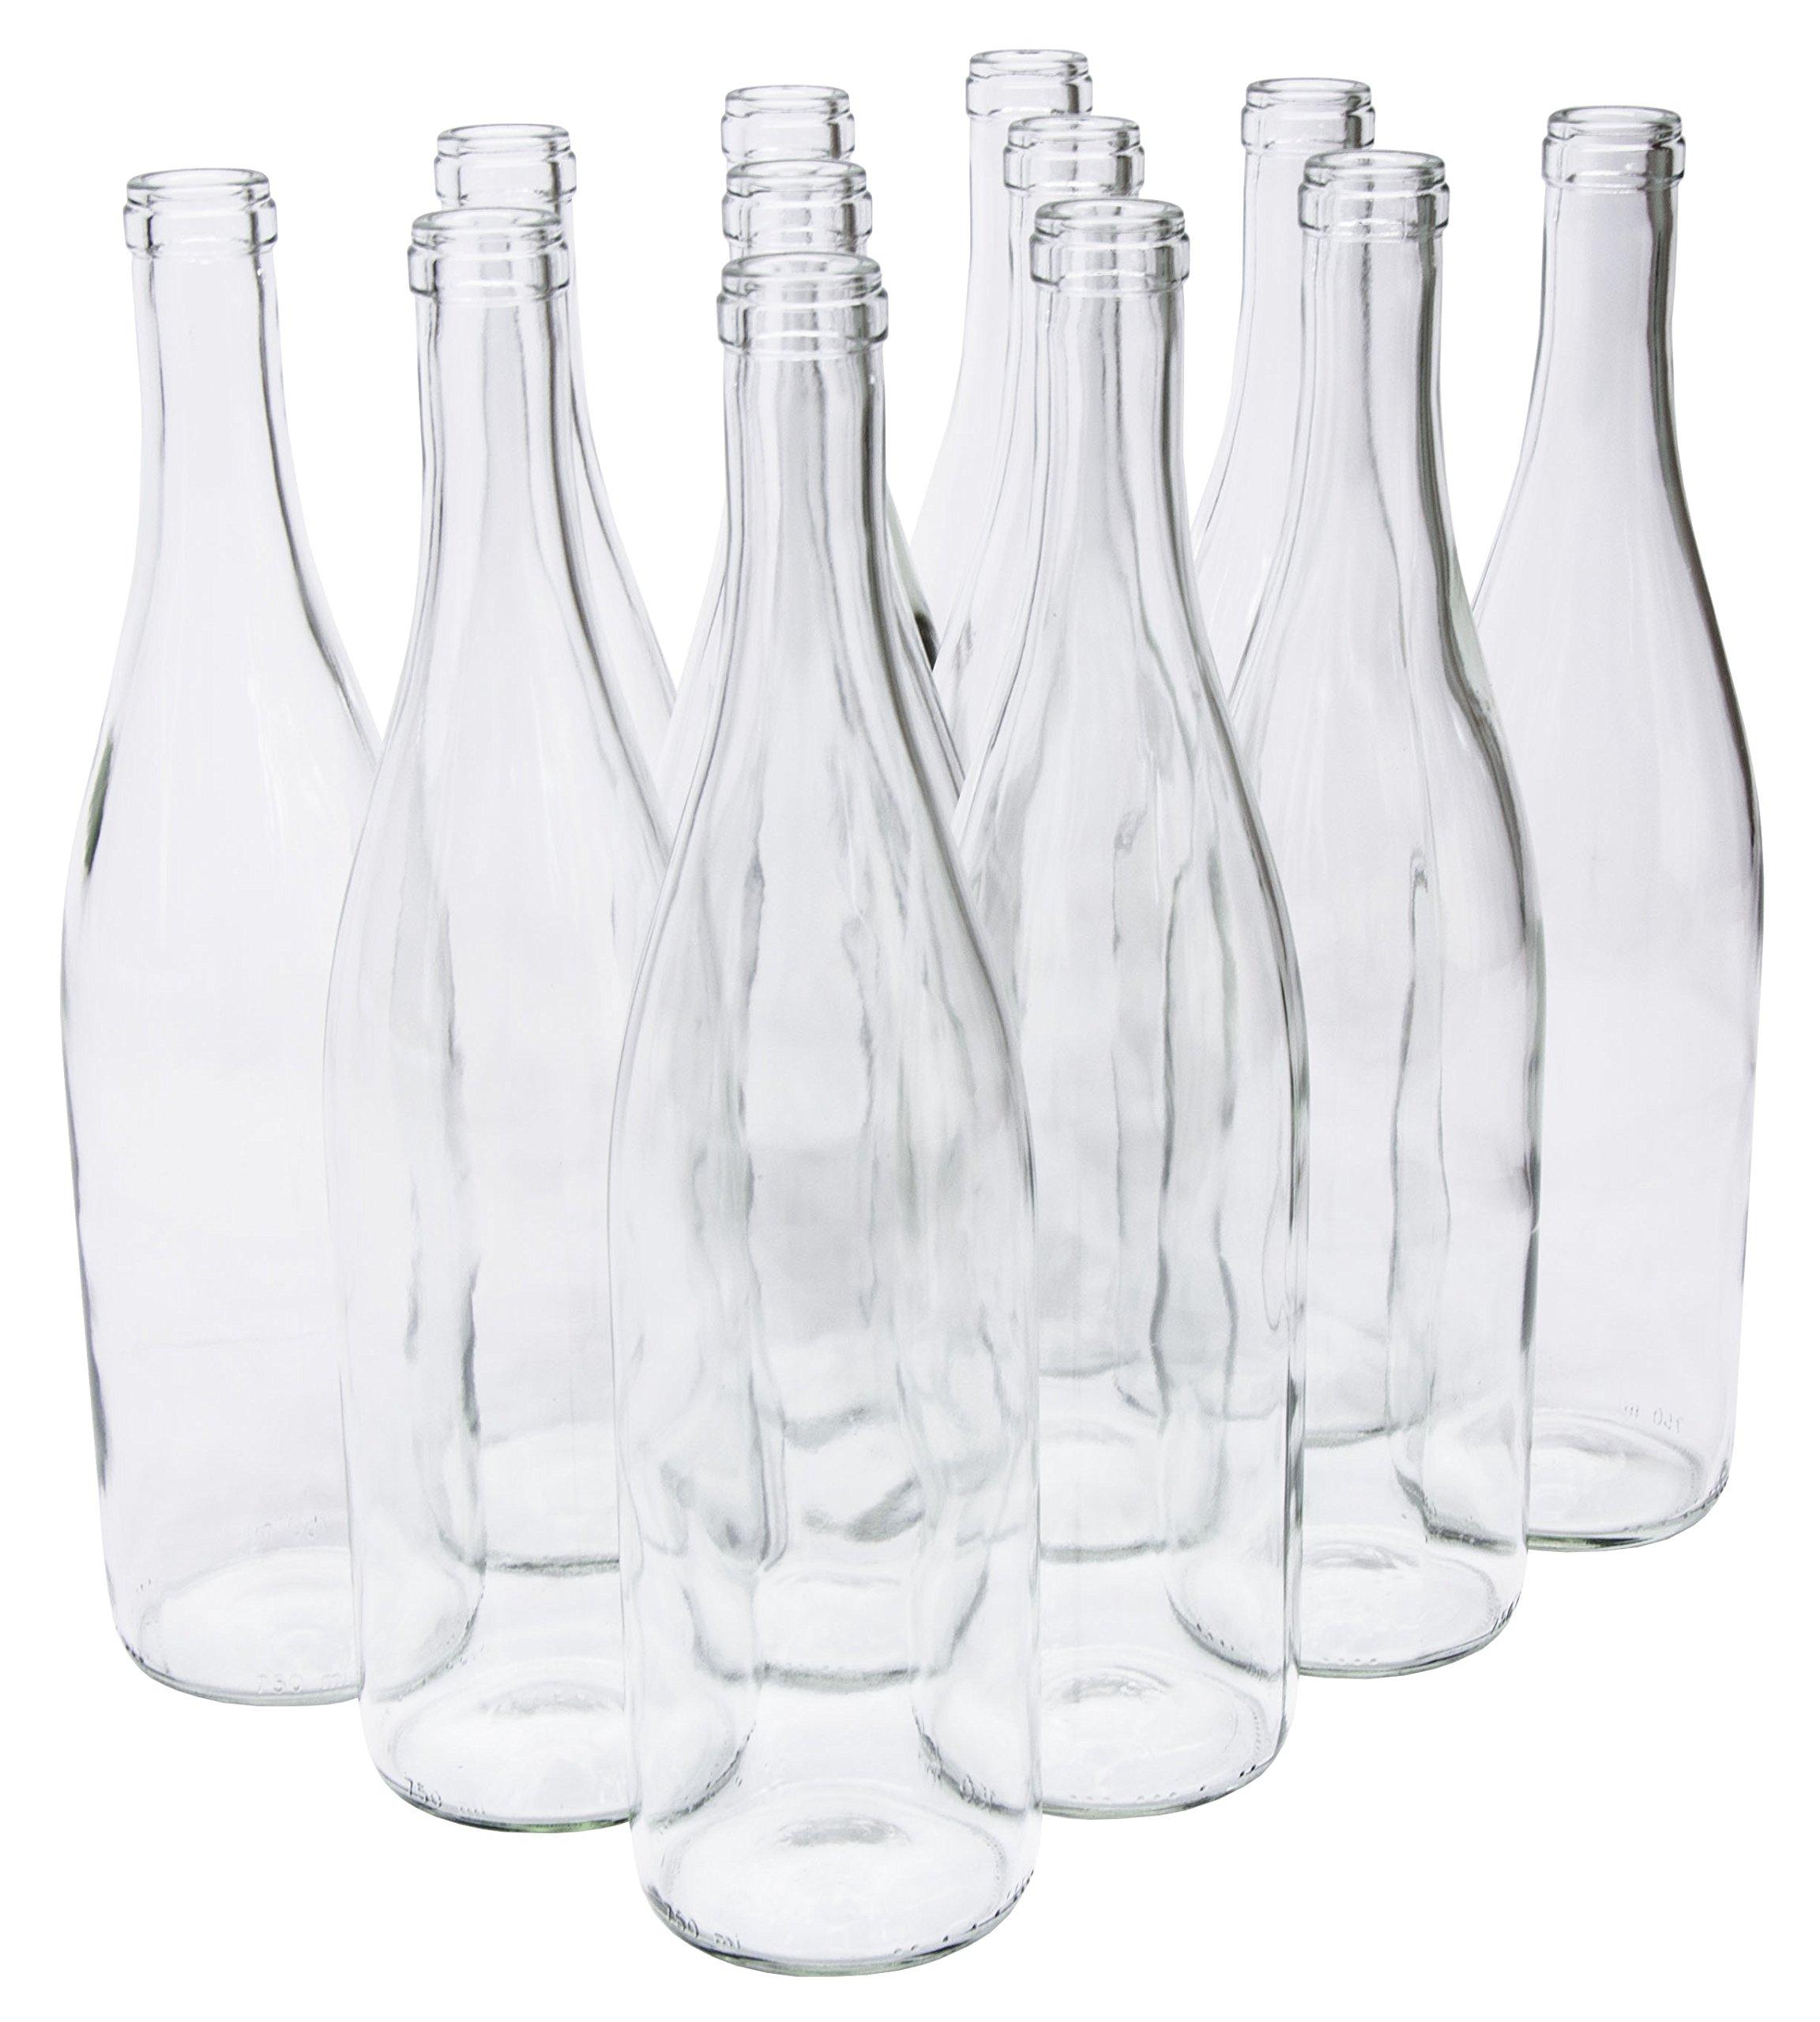 North Mountain Supply LDC W82 Clear/Flint 750Ml GLASS California Hock Wine Bottle Flat-Bottomed Cork Finish